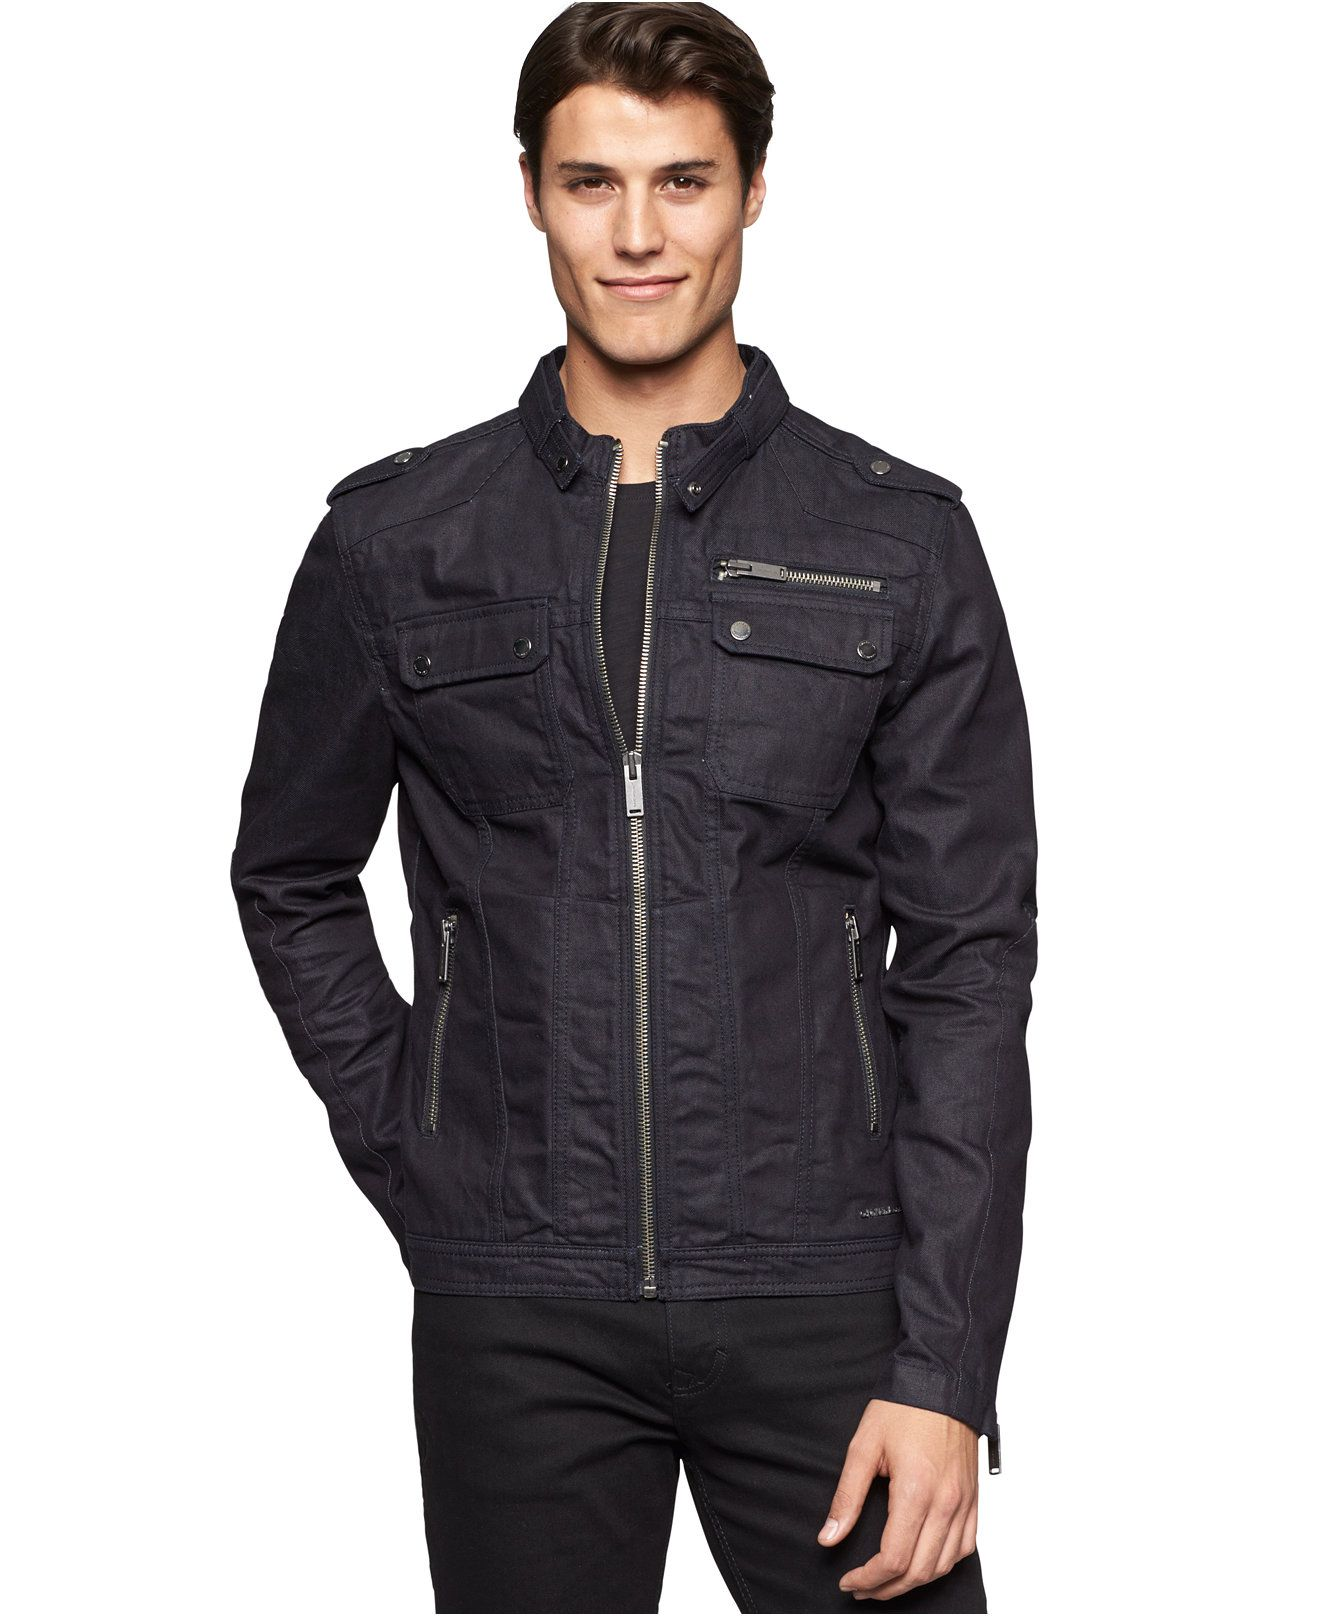 Calvin Klein Jeans Biker Jacket - Coats   Jackets - Men - Macy s ... 5dc8f952b7